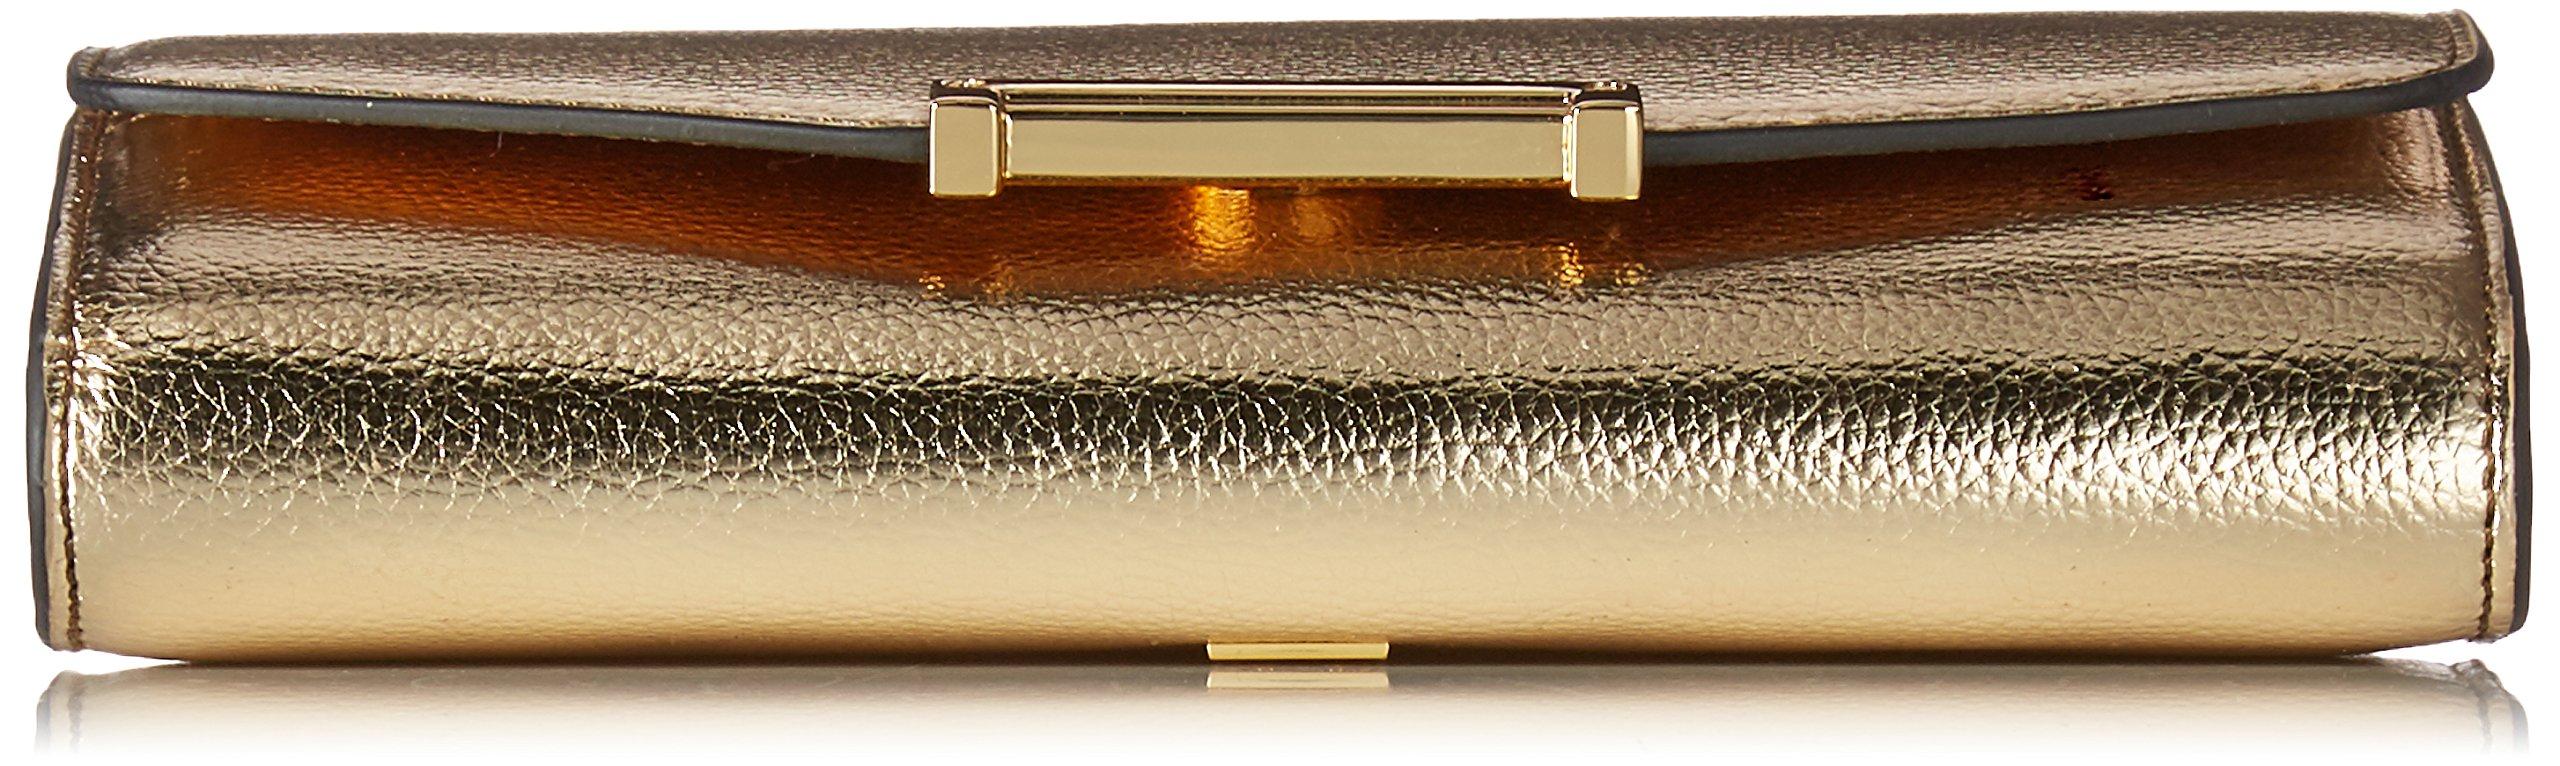 Ivanka Trump Mara Crossbody Wallet-Gold, Metallic Pebble by Ivanka Trump (Image #4)